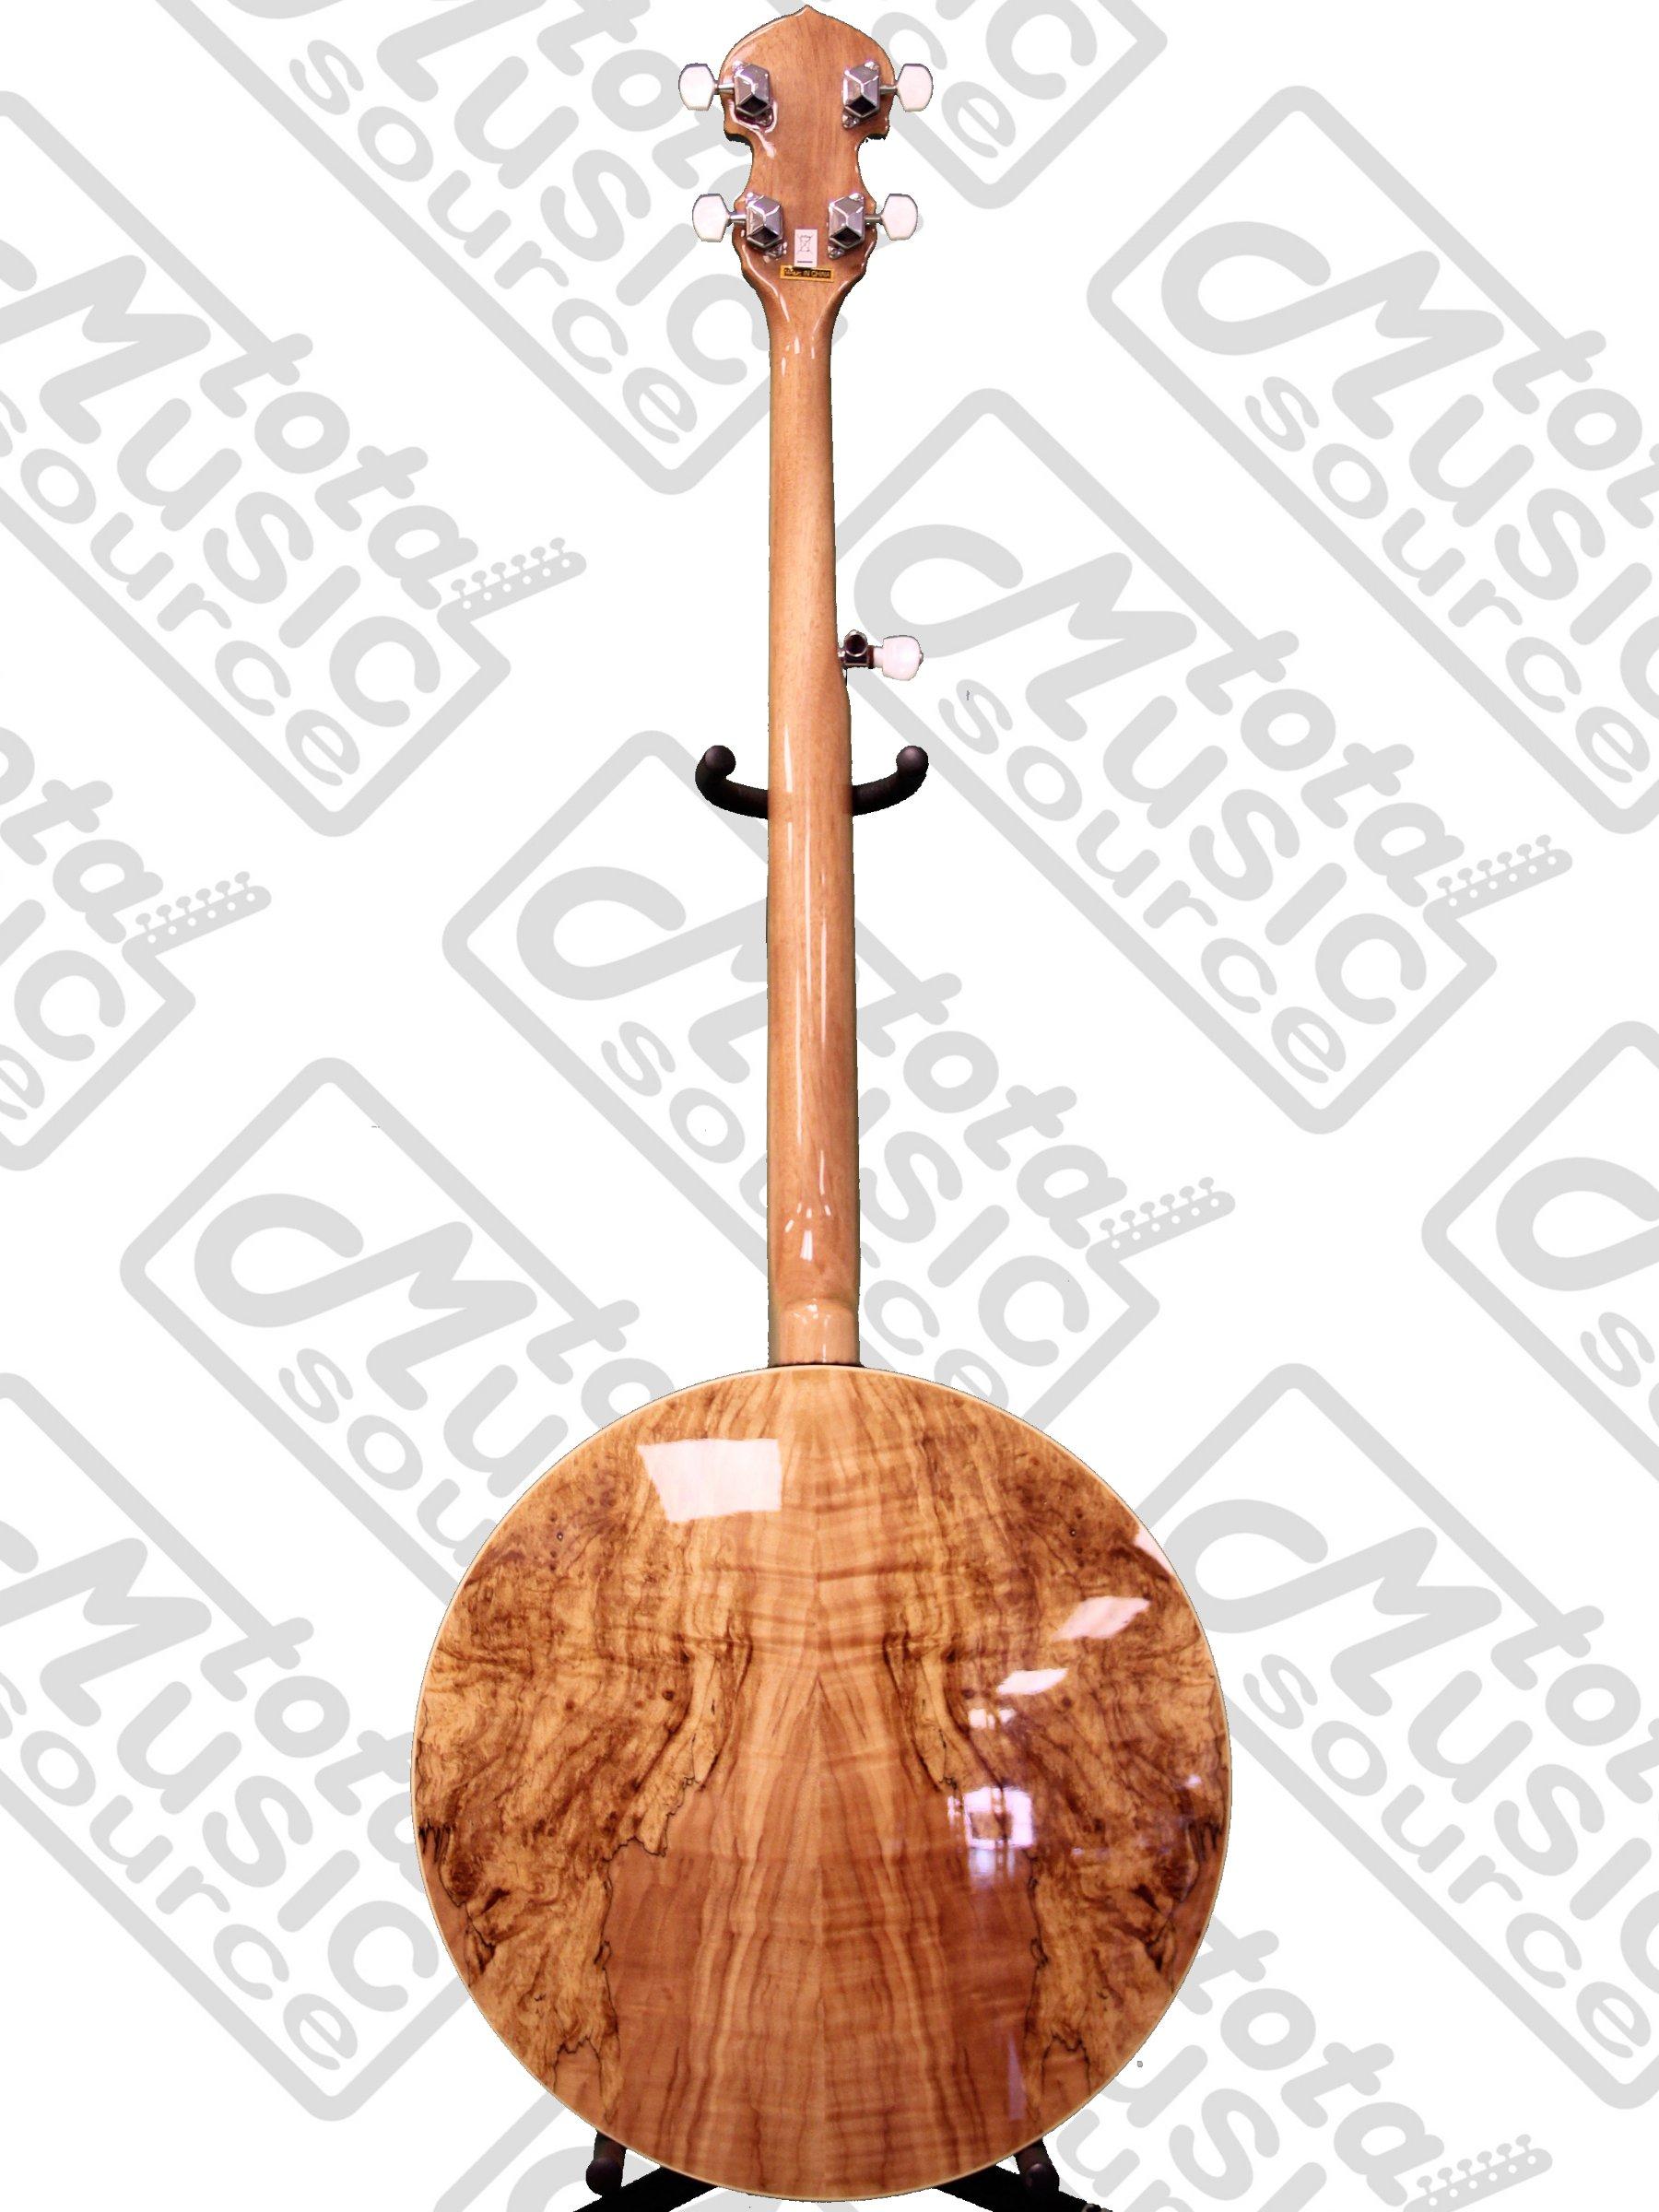 Oscar Schmidt OB5SP 5-String Banjo, Remo Head,Spalted Maple Resonator, Gloss Finish by Oscar Schmidt (Image #6)